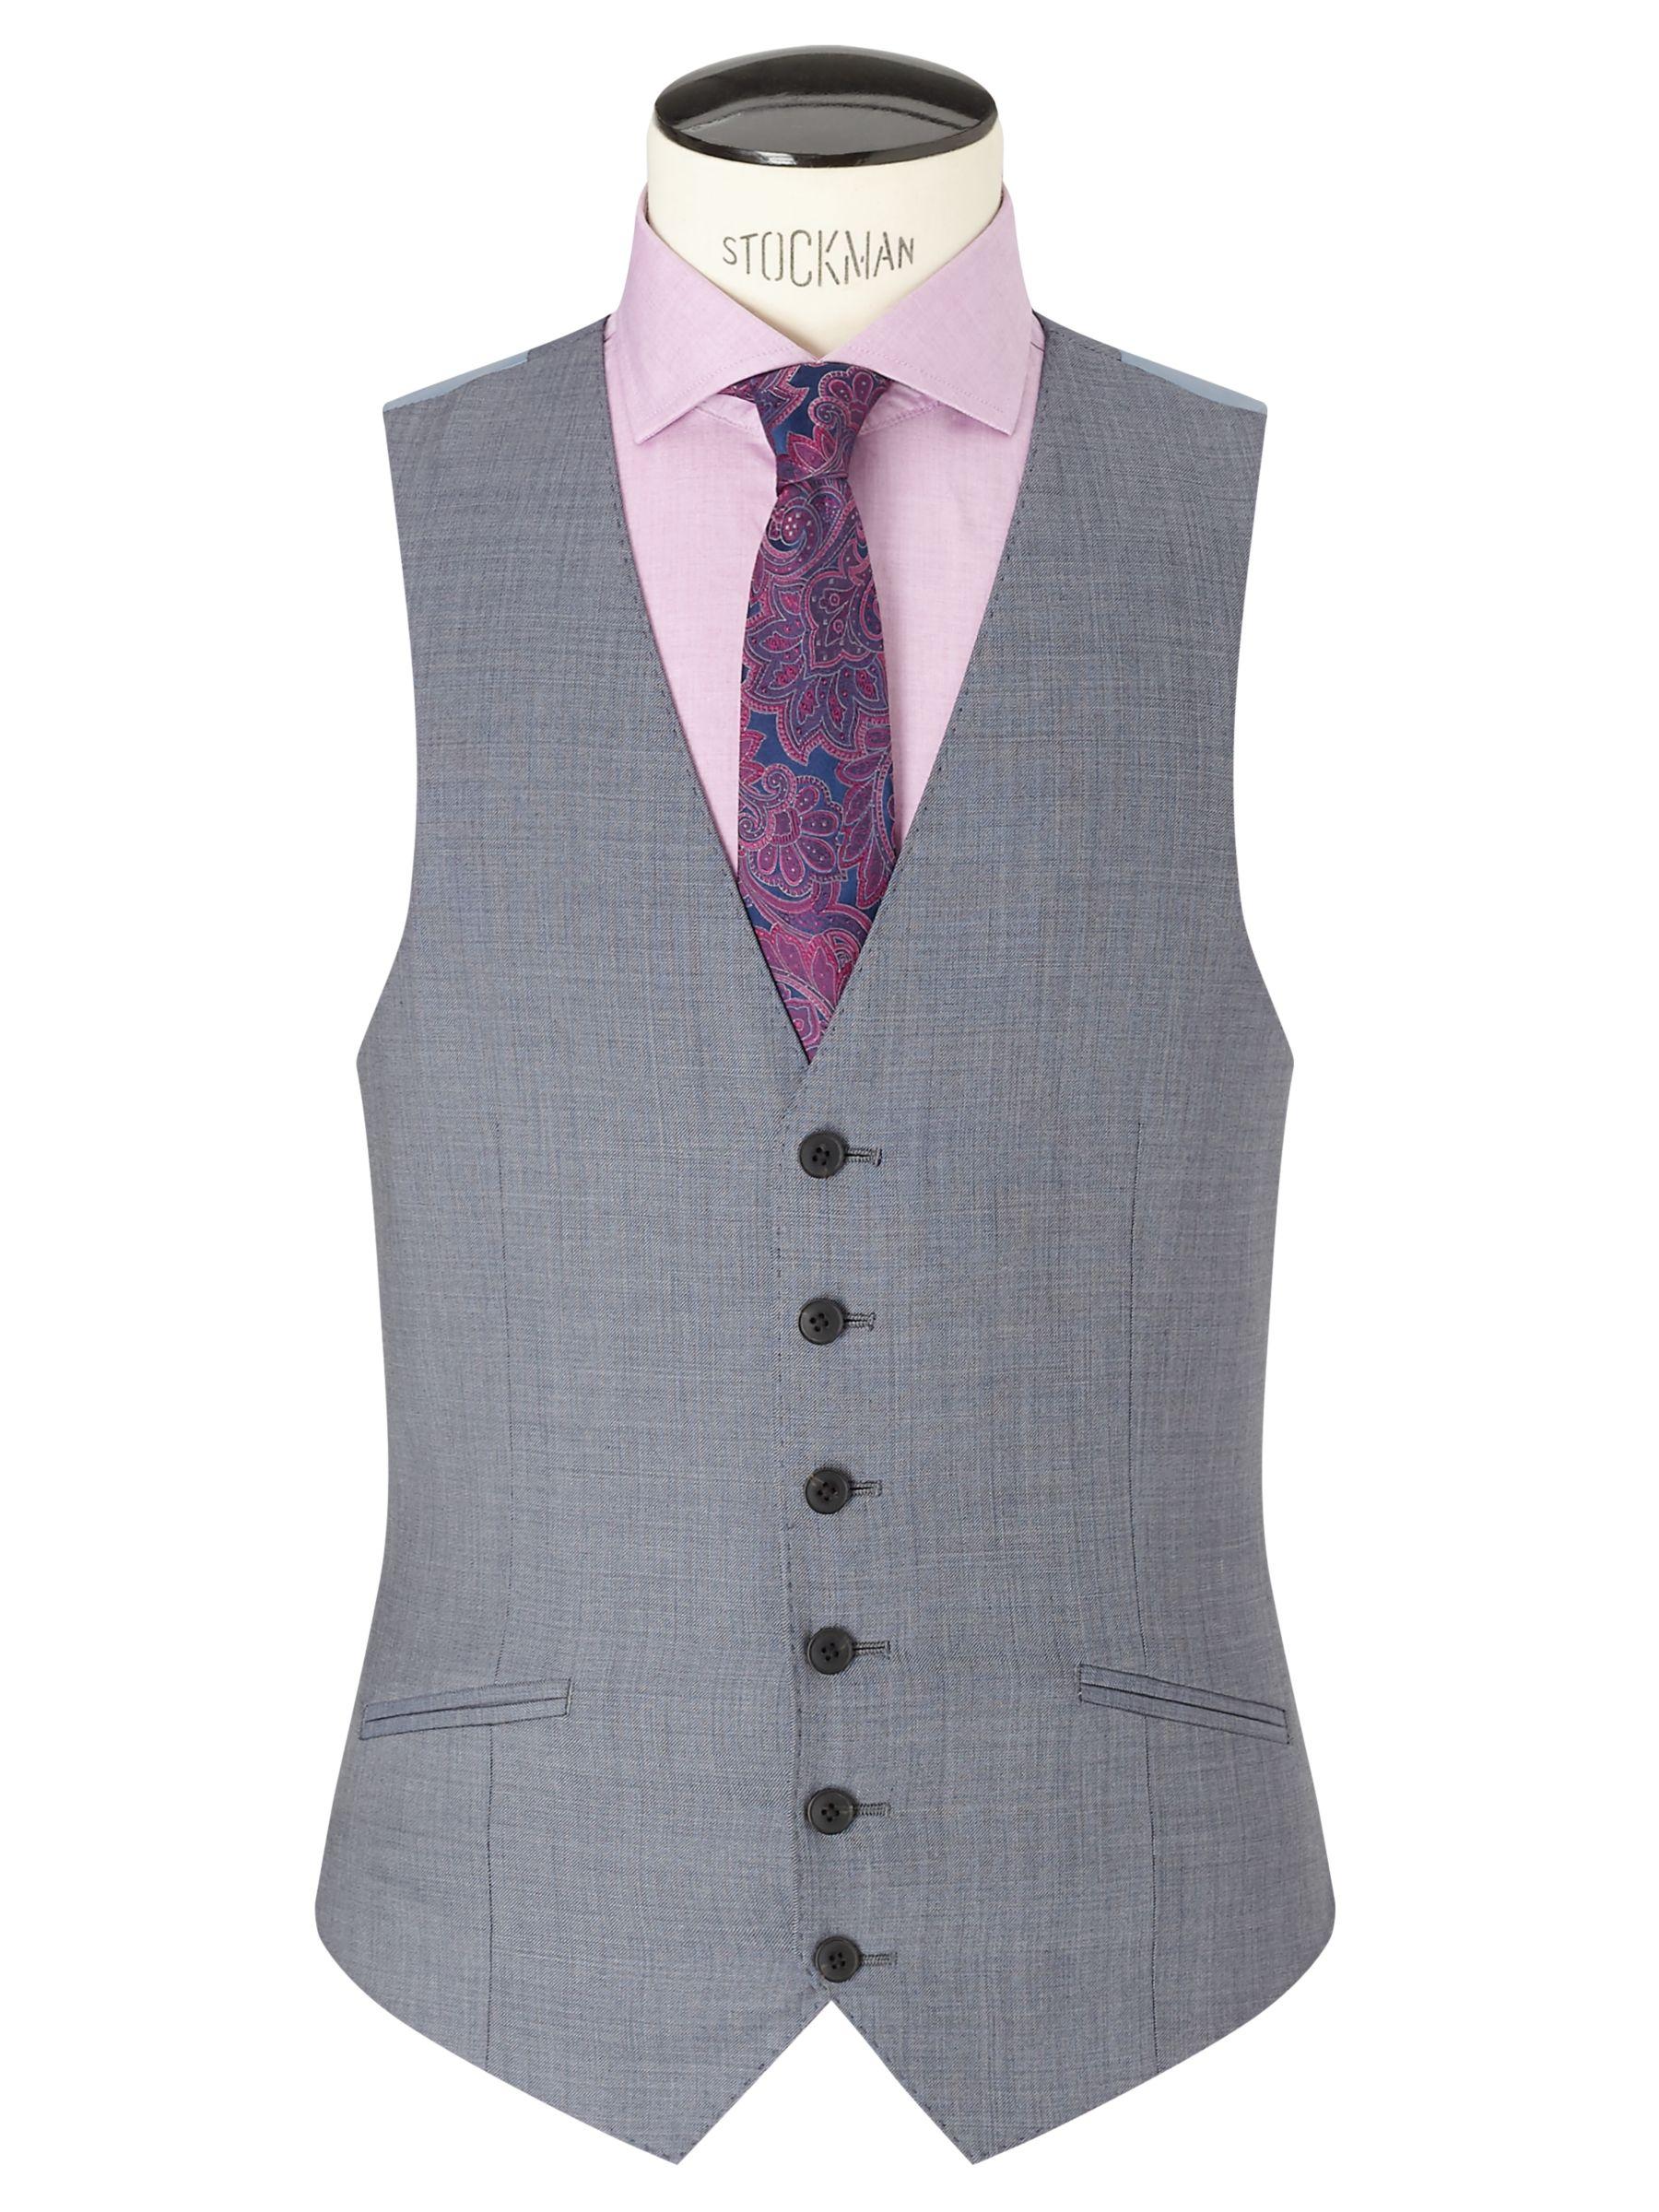 Richard James Mayfair Richard James Mayfair Wool Sharkskin Slim Fit Waistcoat, Slate